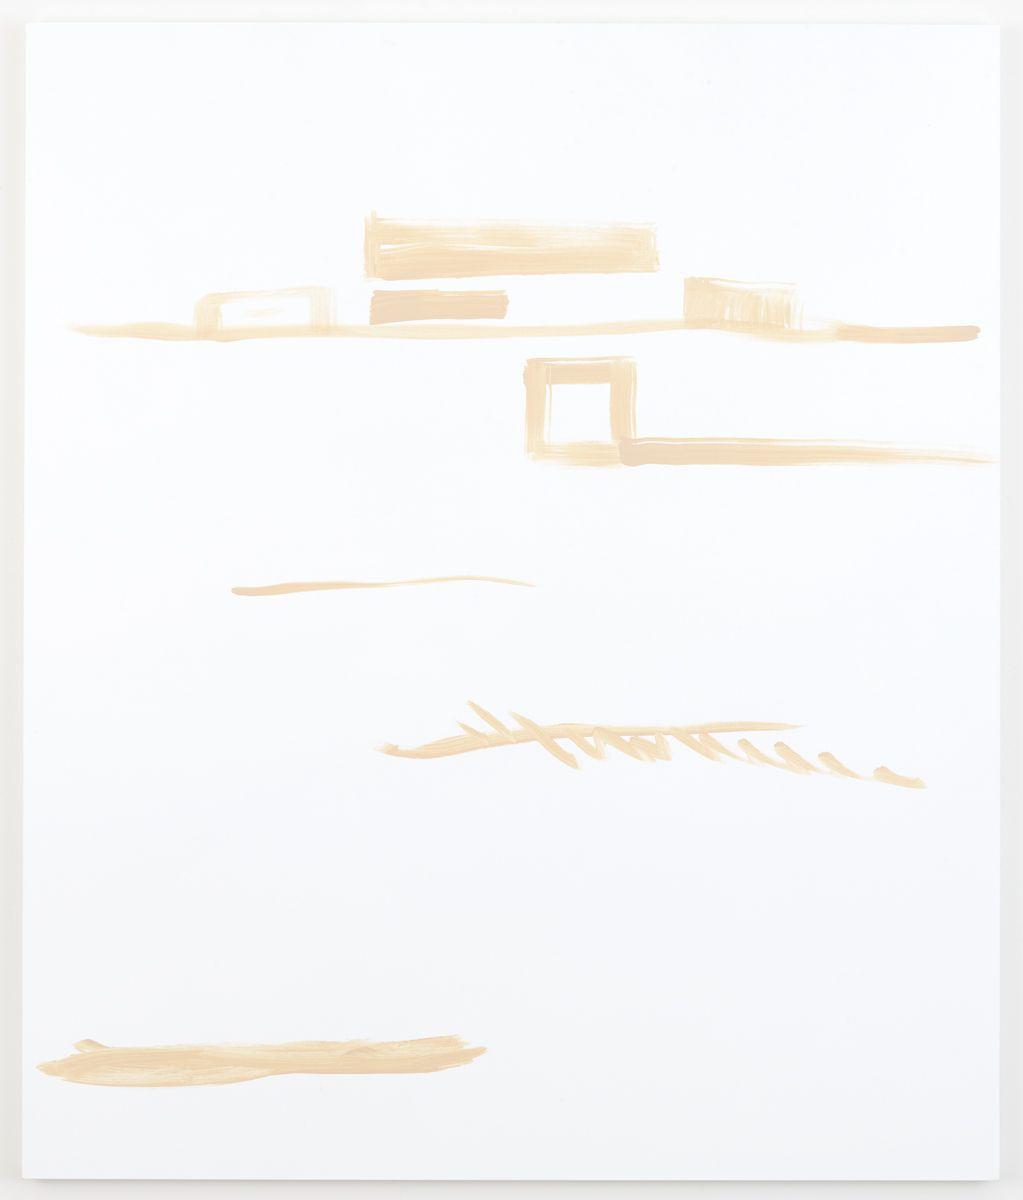 Michael Krebber Herbes de Provence, Le champ, 2018 Acrylic on canvas 70 x 59 inches (177.8 x 149.9 cm)